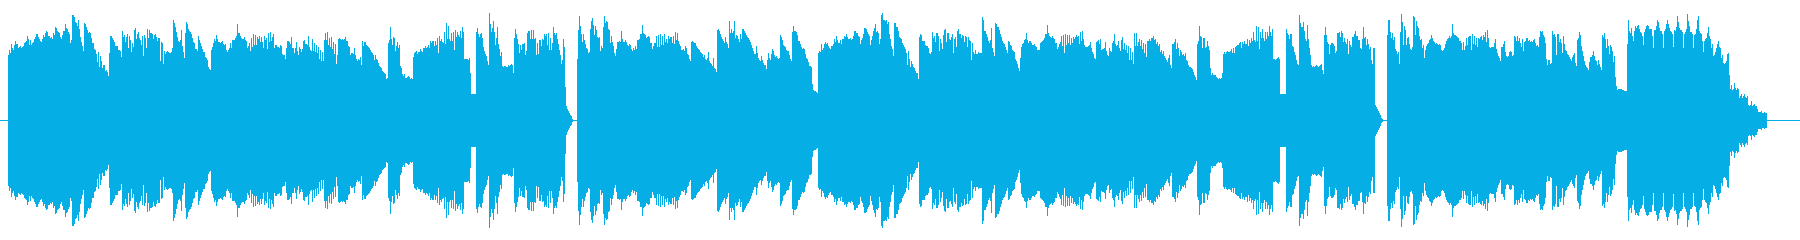 NES STG C06-1(エンディングの再生済みの波形